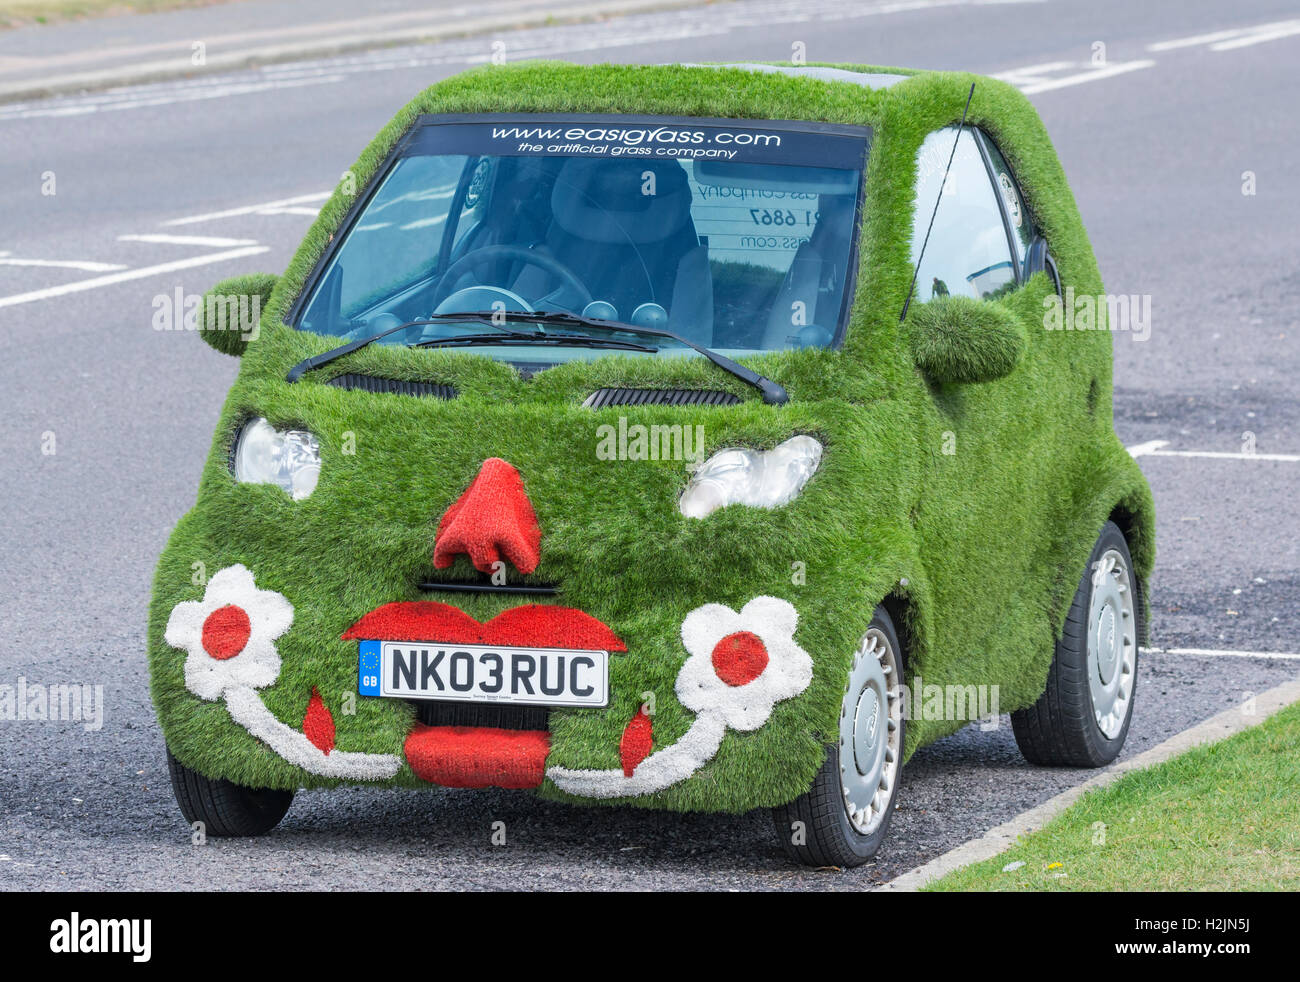 Unique Easigrass Easibug smartcar parked on a road. - Stock Image